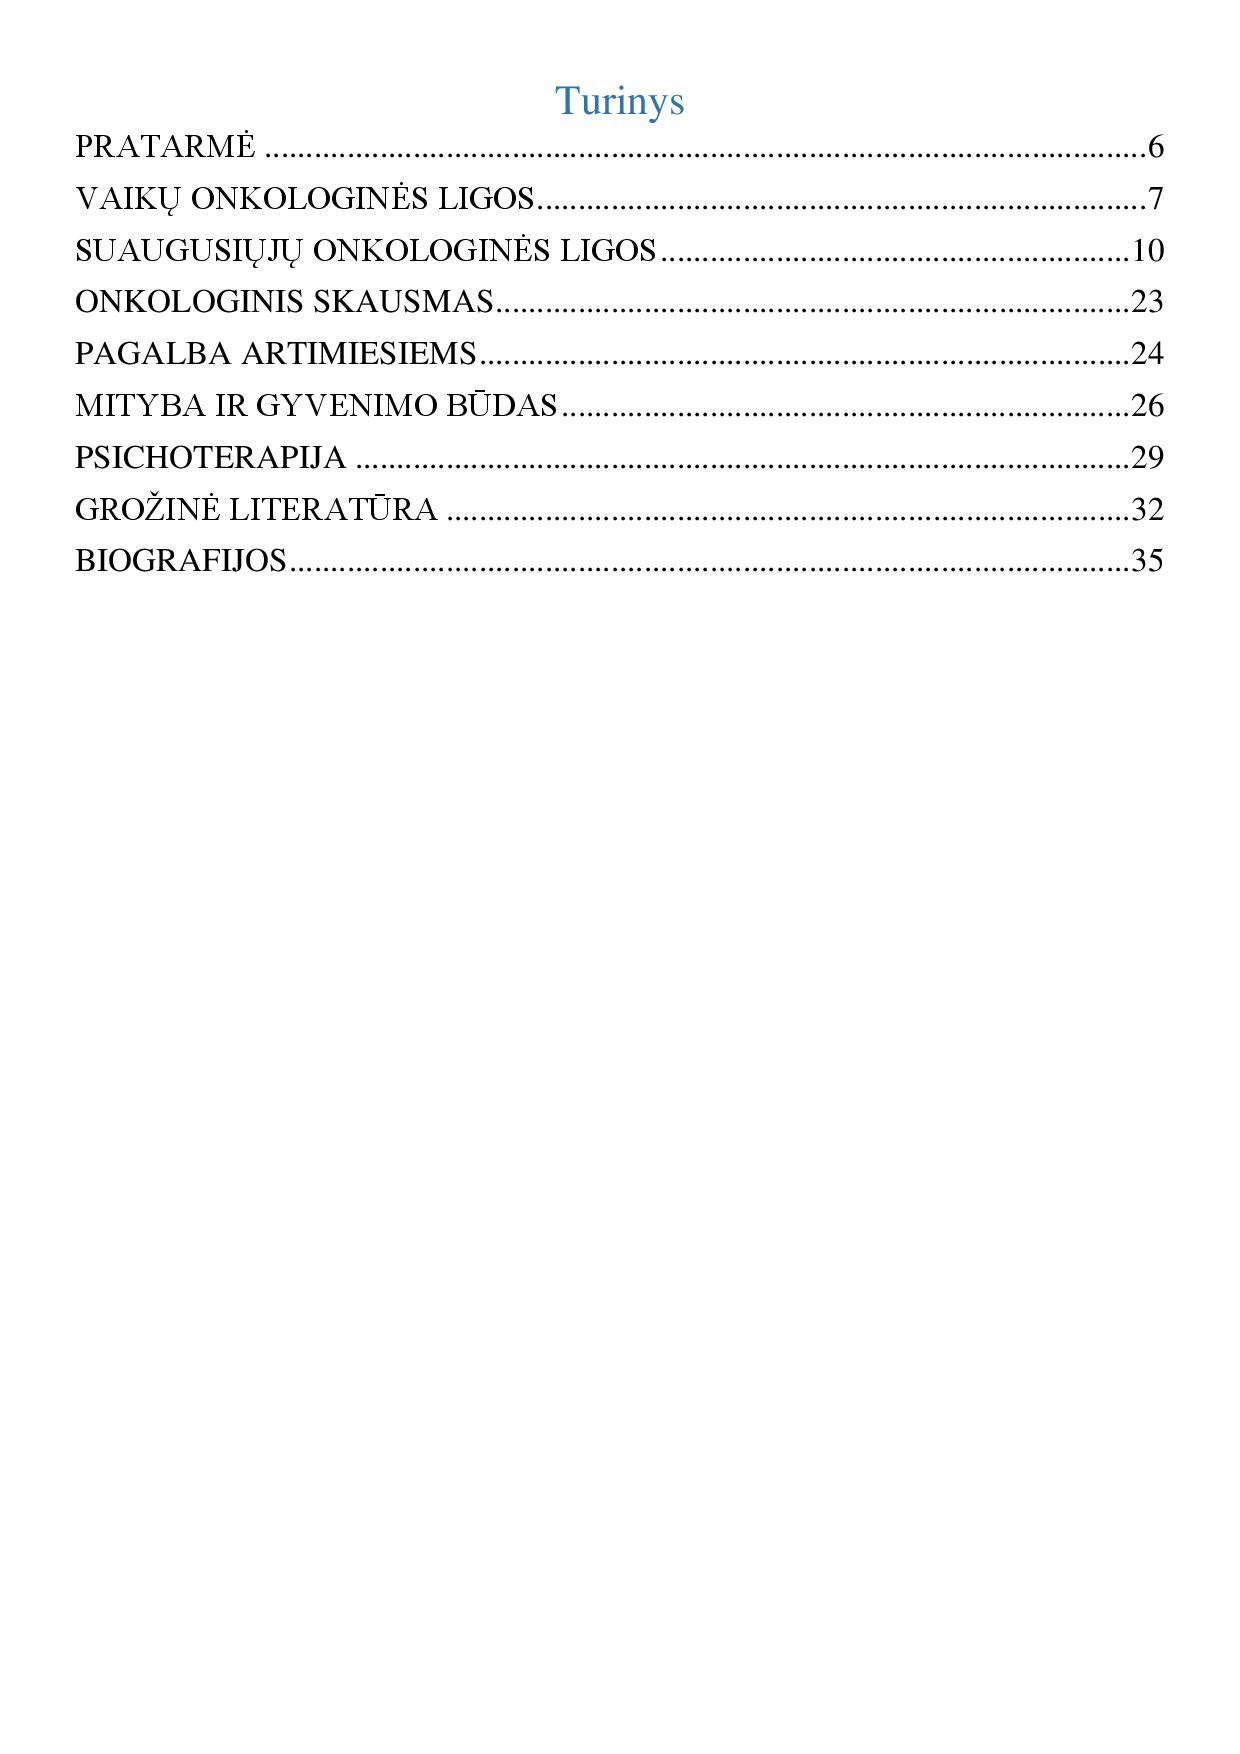 Sergantiems onkologinėmis ligomis -page-006